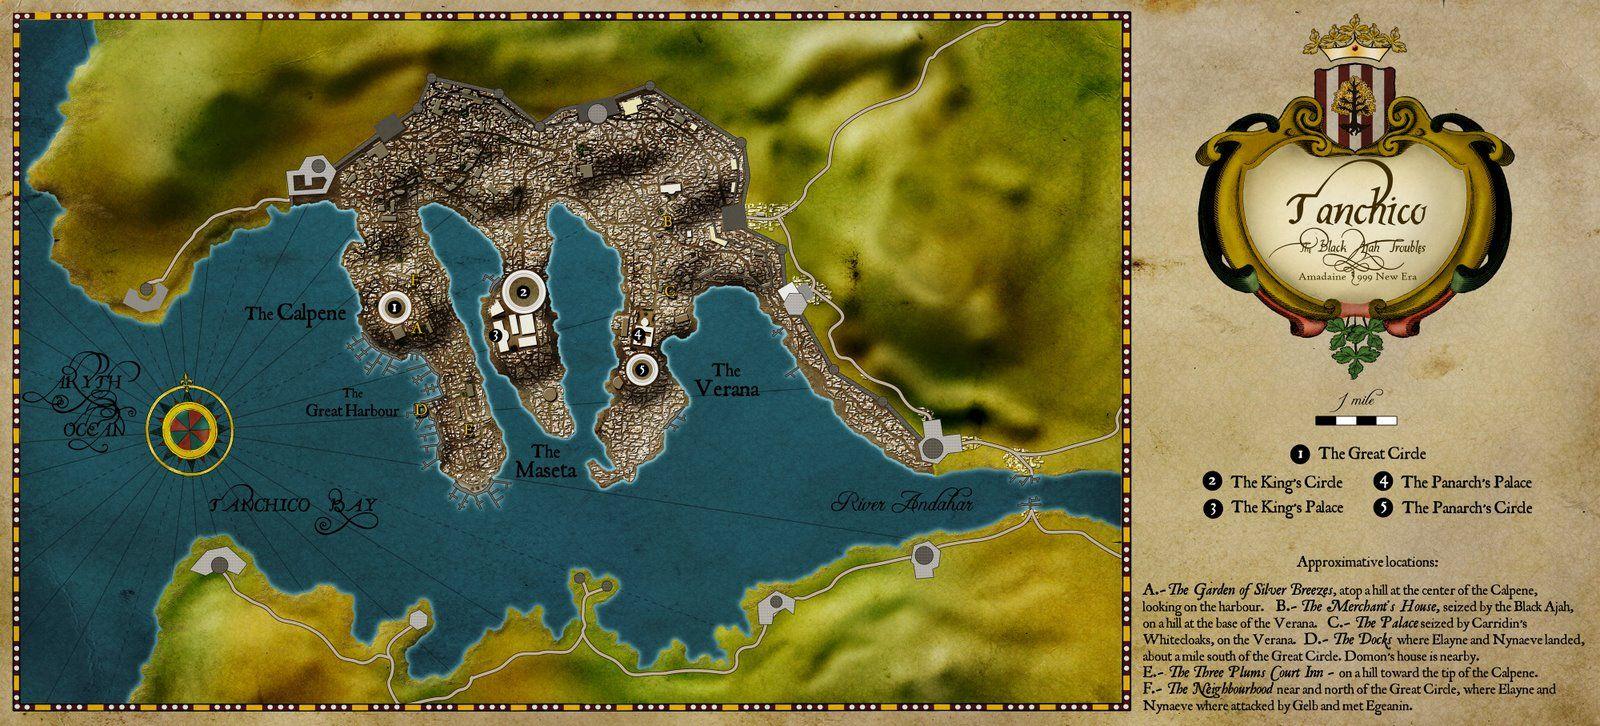 Tanchico fantasy map map wheel